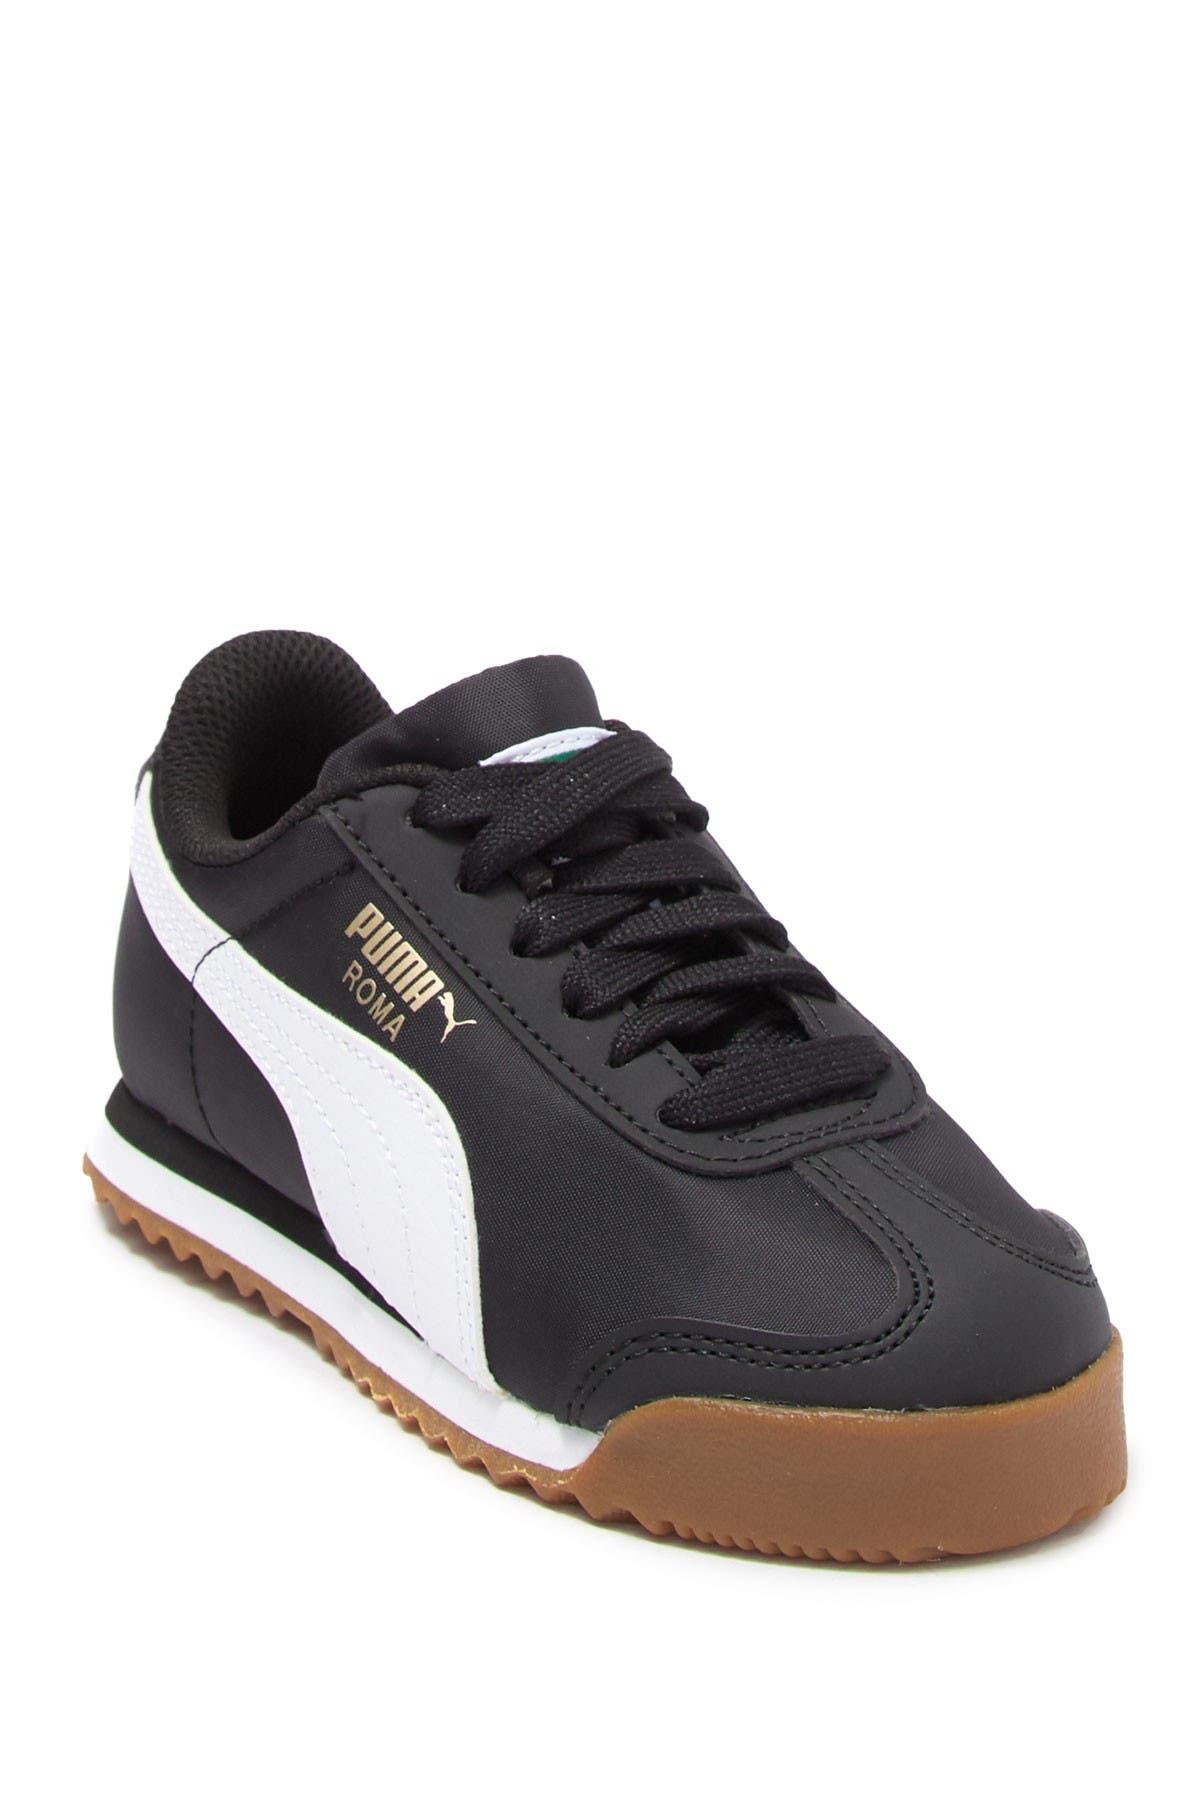 Image of PUMA Roma Basic Summer Sneaker